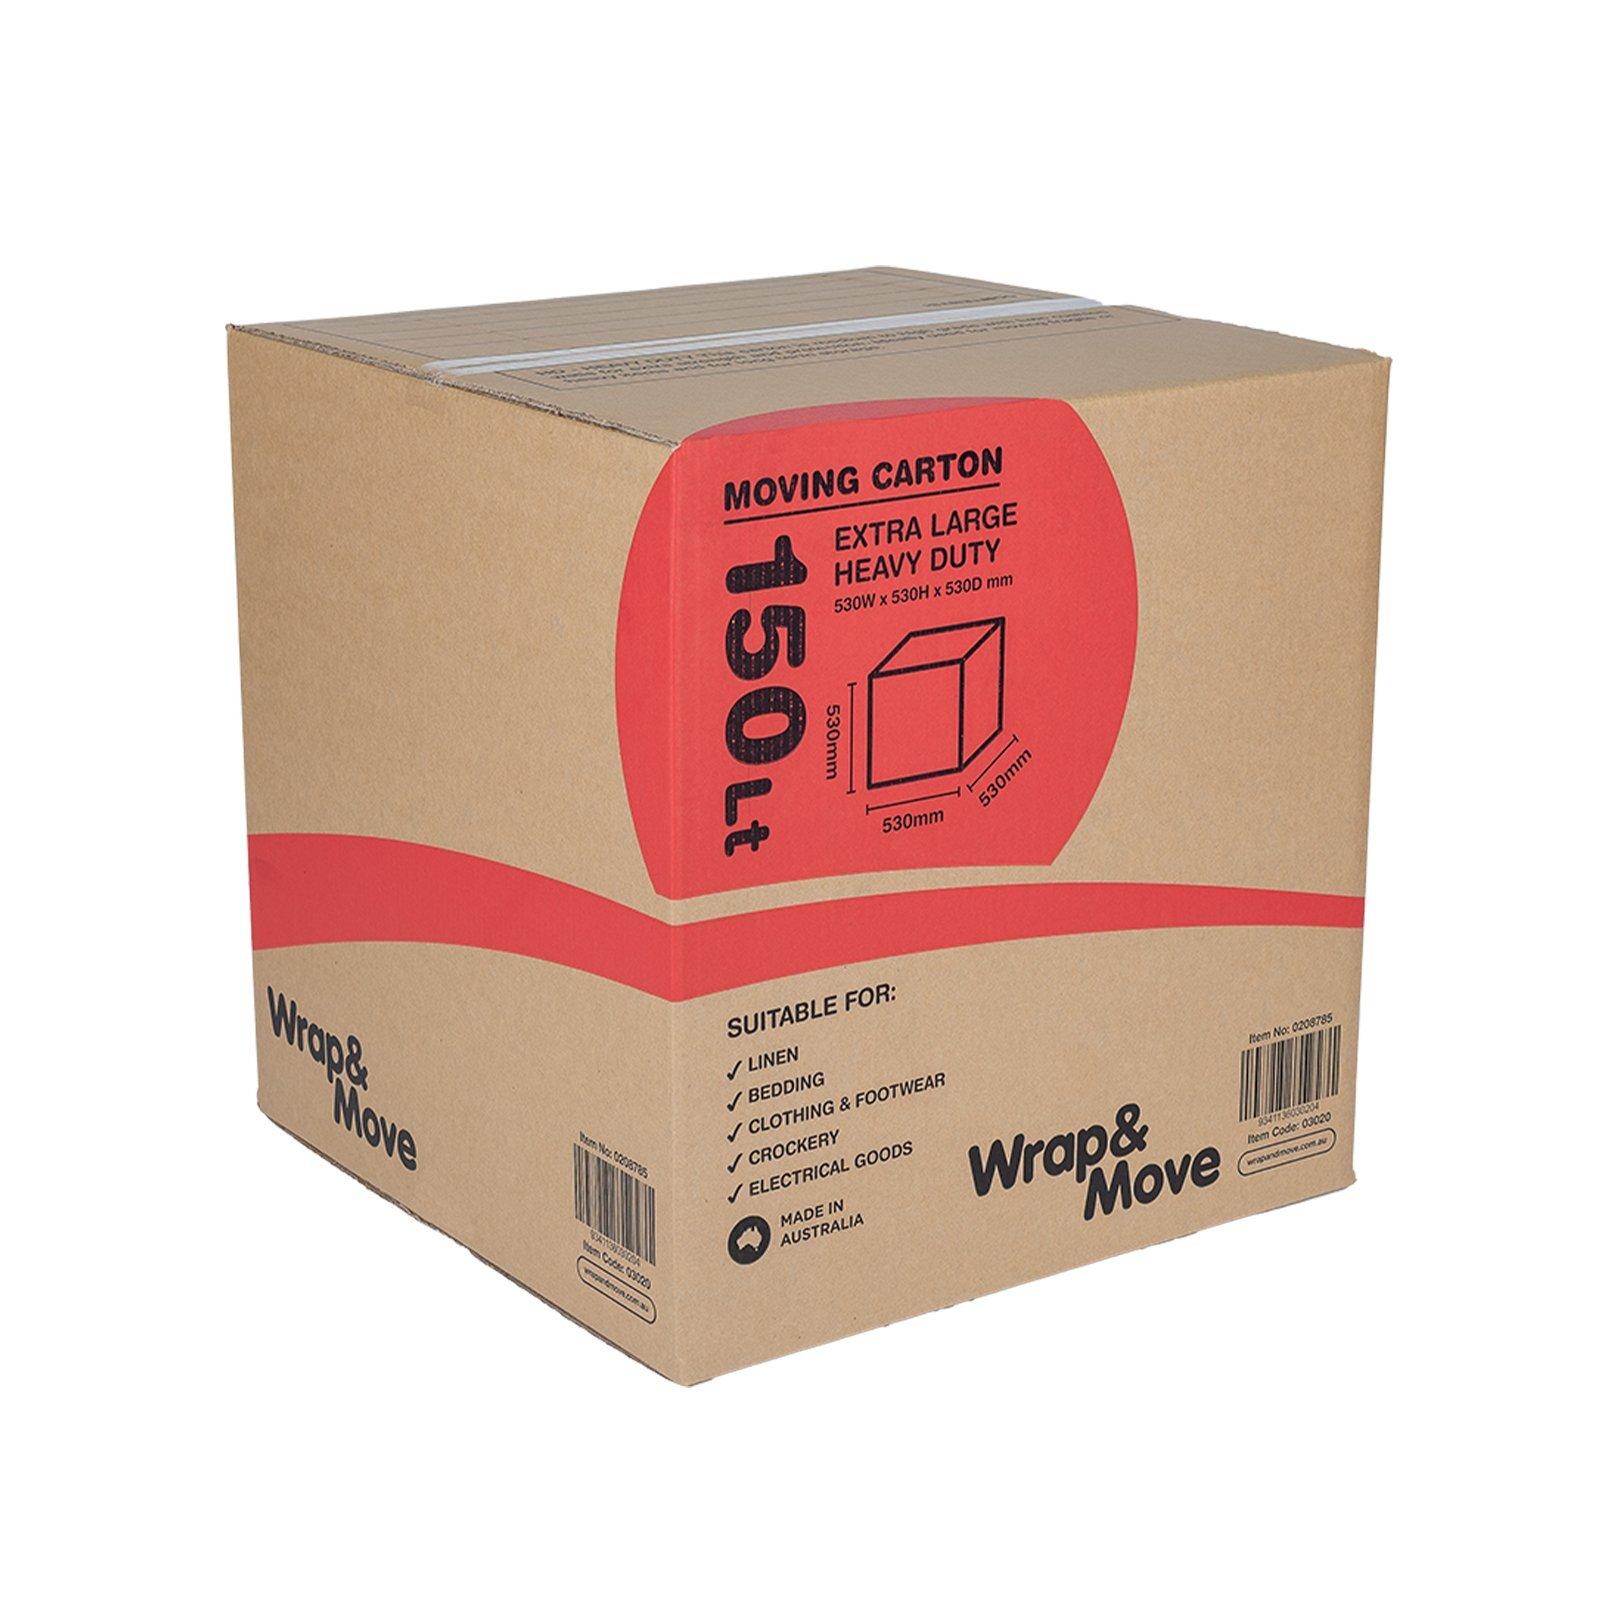 Wrap & Move 530 x 530 x 530mm 150L Heavy Duty Moving Carton